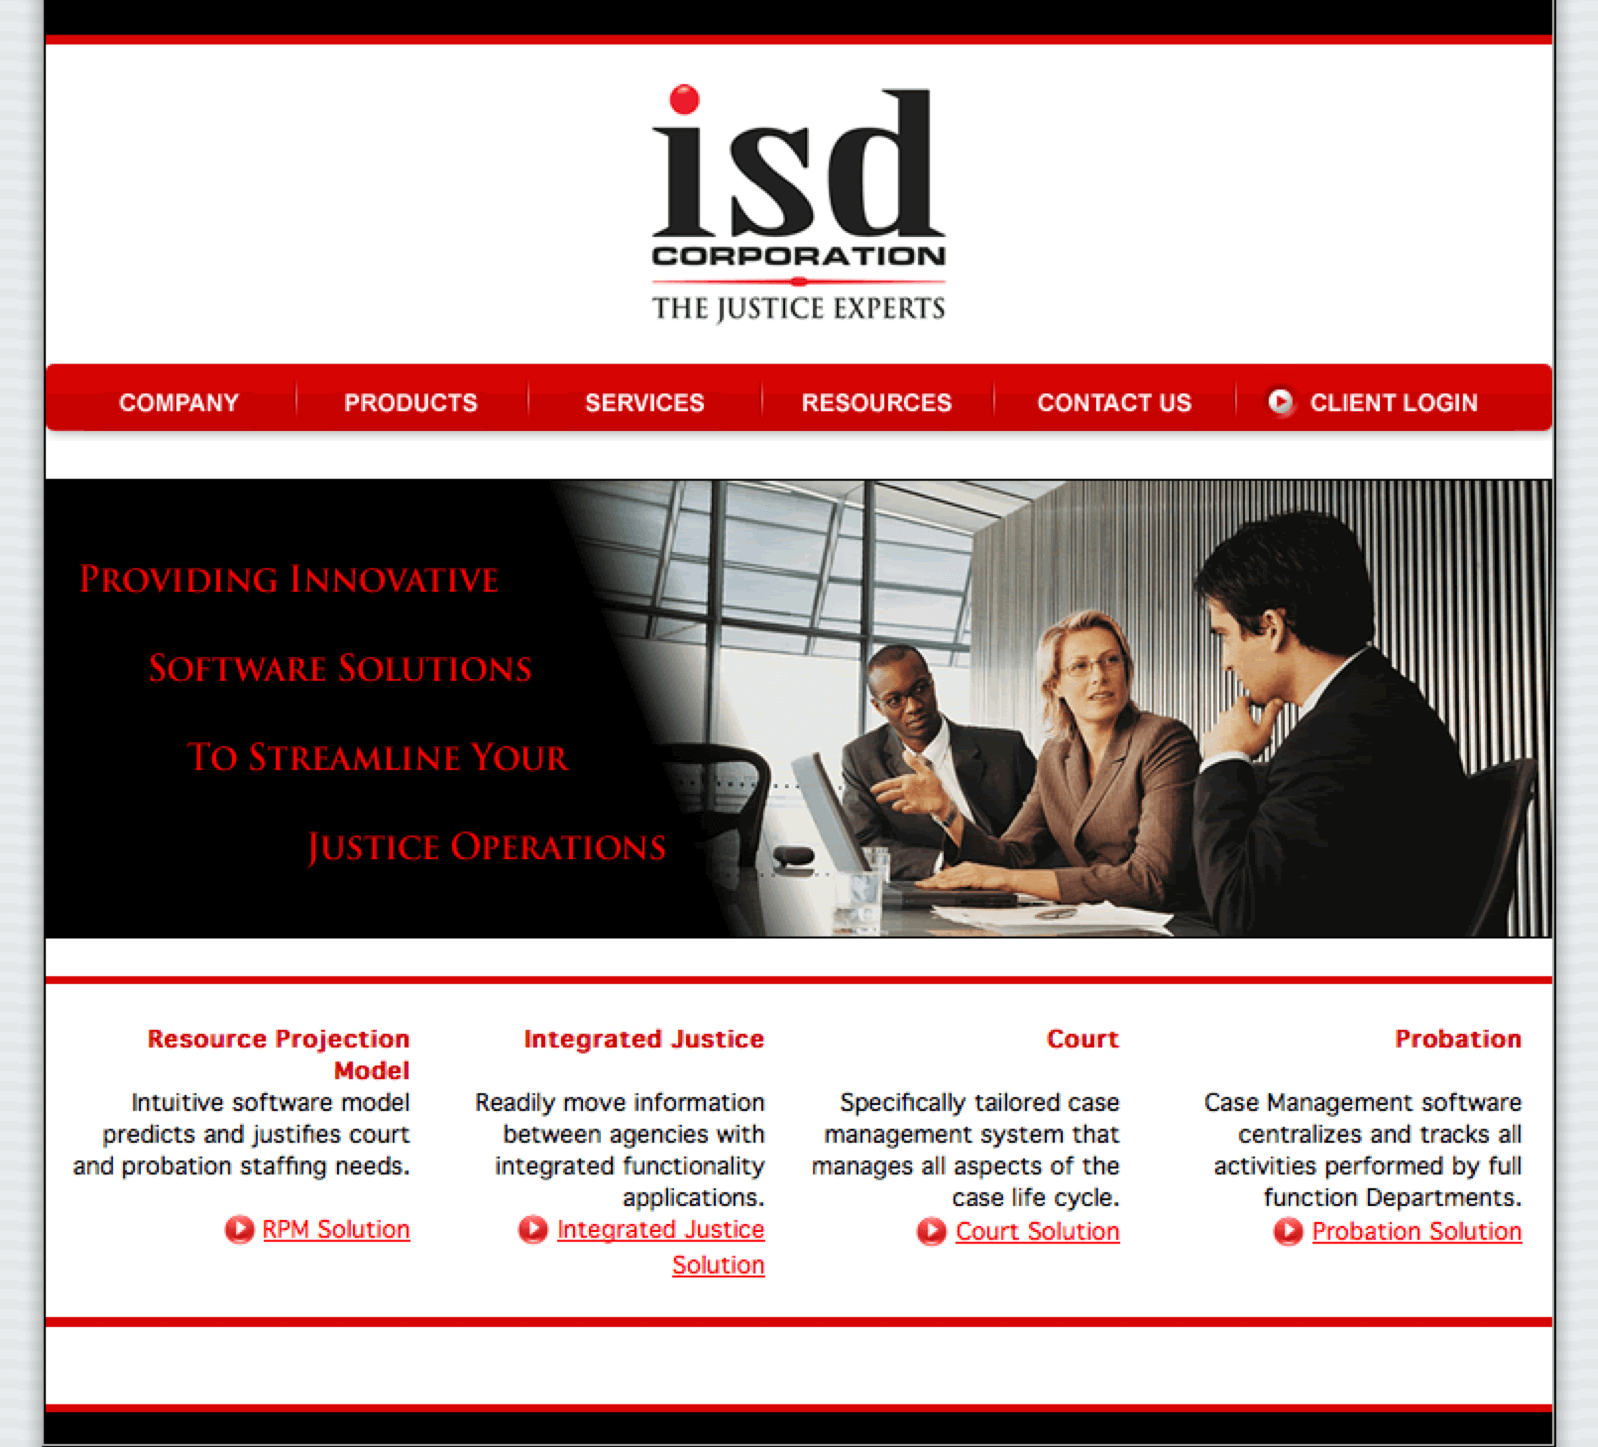 ISD-Corporation-Judicial-Software-Website-Design-Home-Page